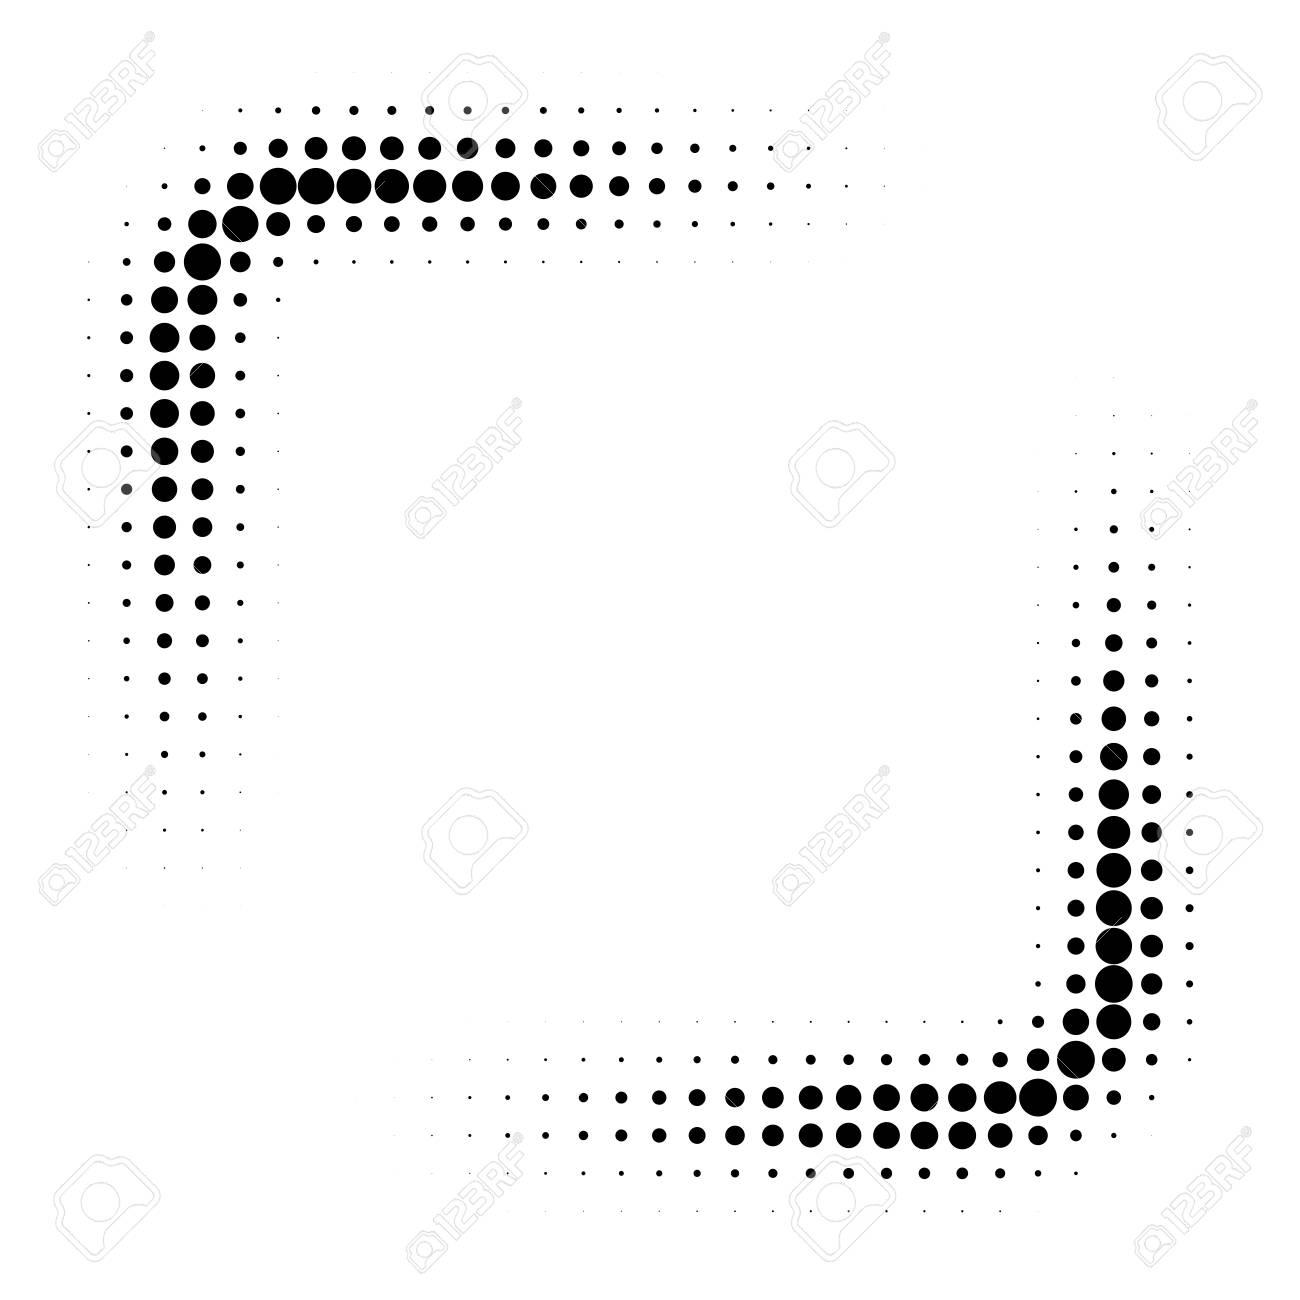 Halftone technique printing with corner design, vector illustration